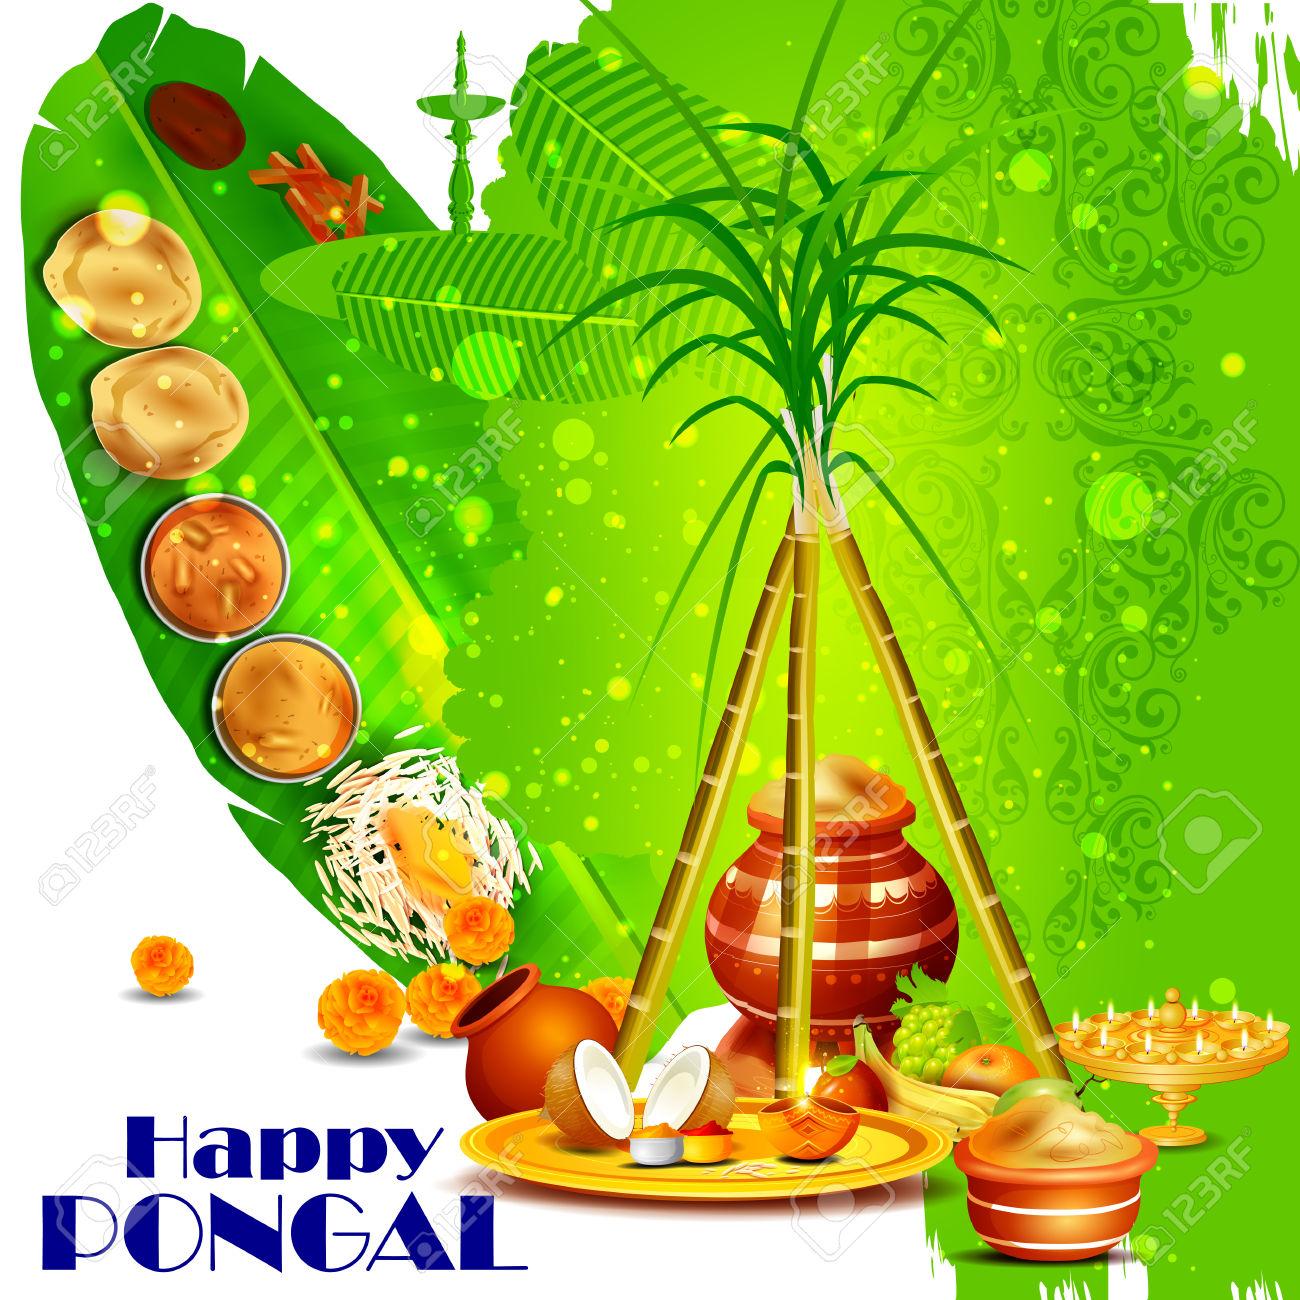 224 Tamil Nadu India Stock Vector Illustration And Royalty Free.